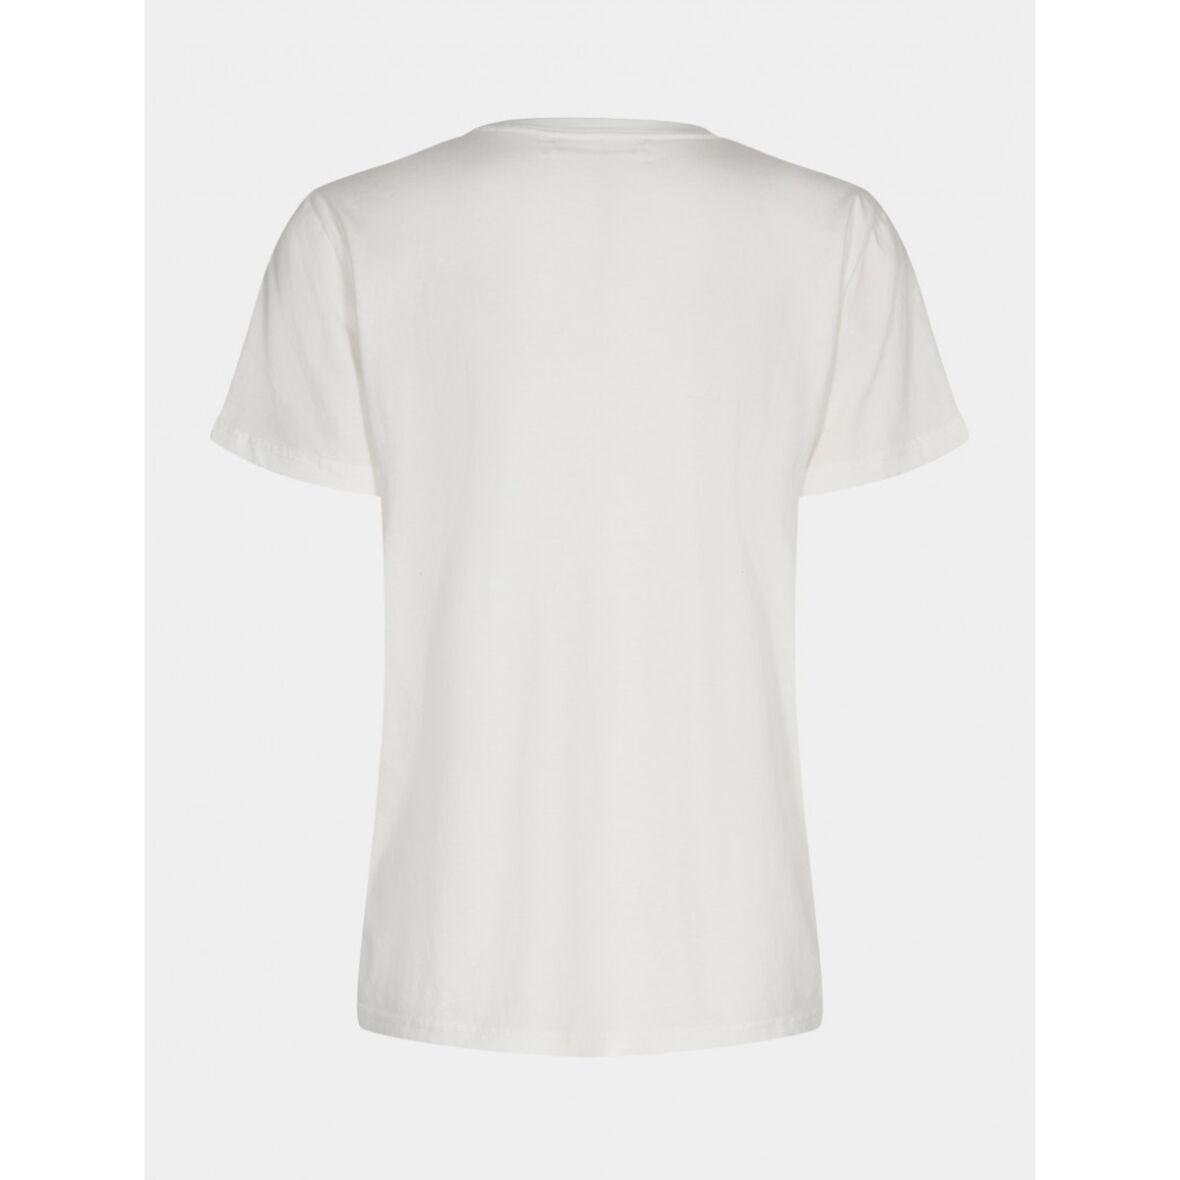 SOFIE SCHNOOR - Cady T-Shirt Off White s211271